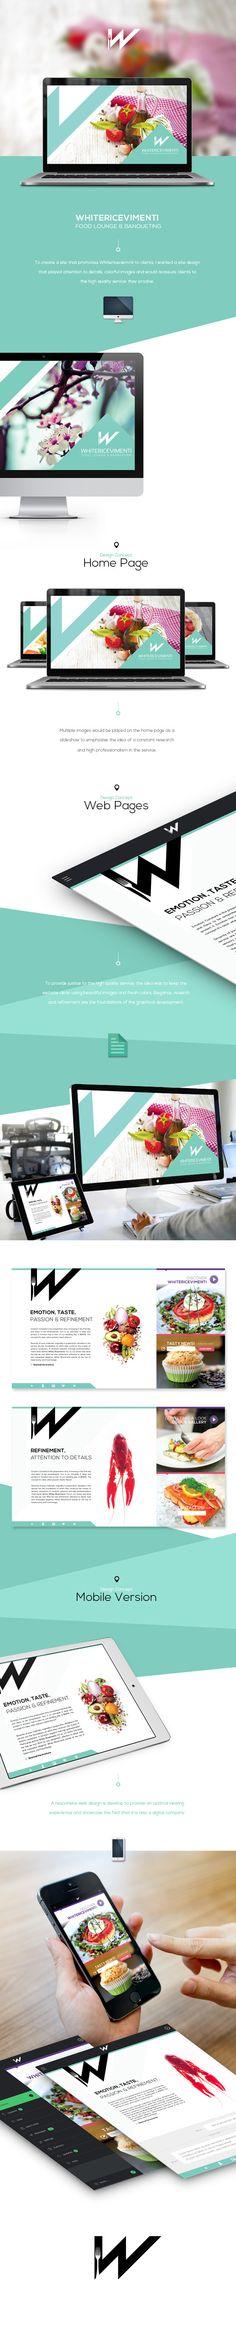 WhiteRicevimenti | Web Design by Johanna Roussel, via Behance